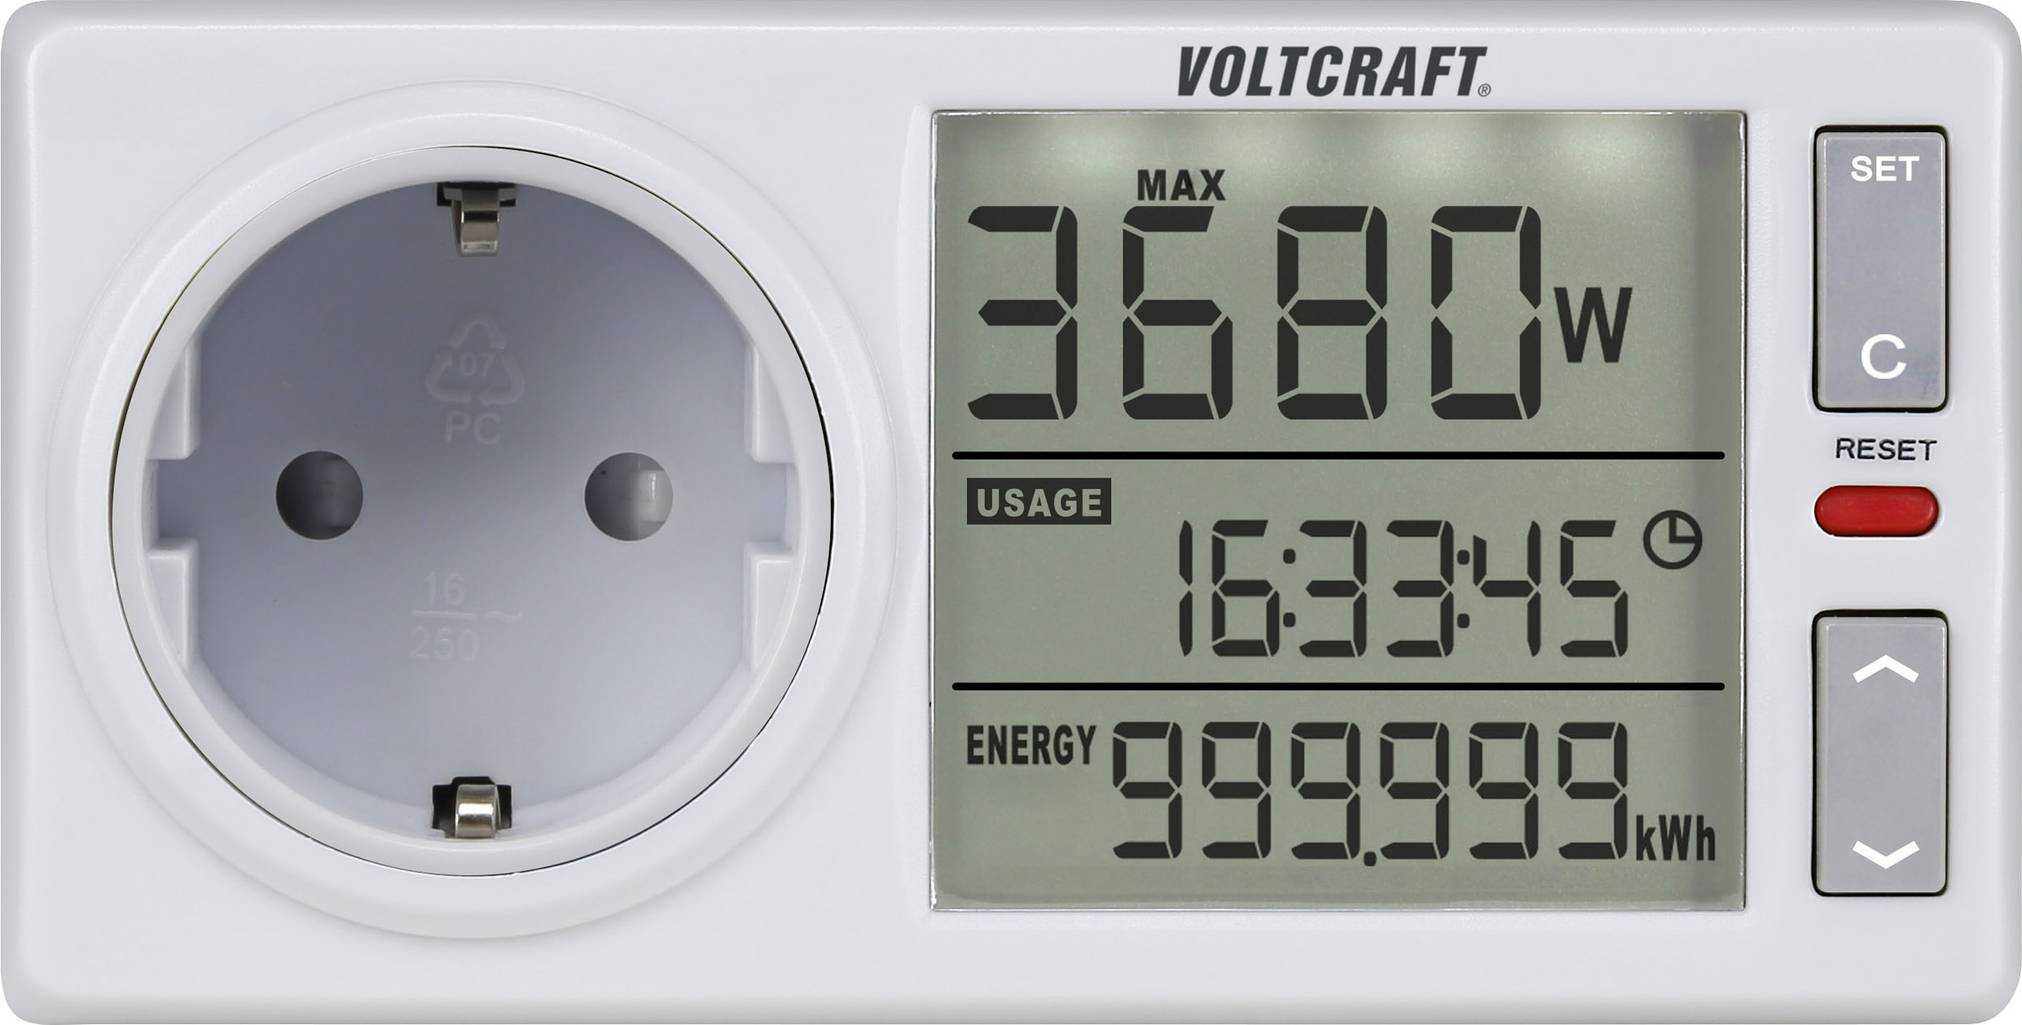 digitalo voltcraft 4500advanced de energiekosten messgeraet fuer 22 e statt 2999 e